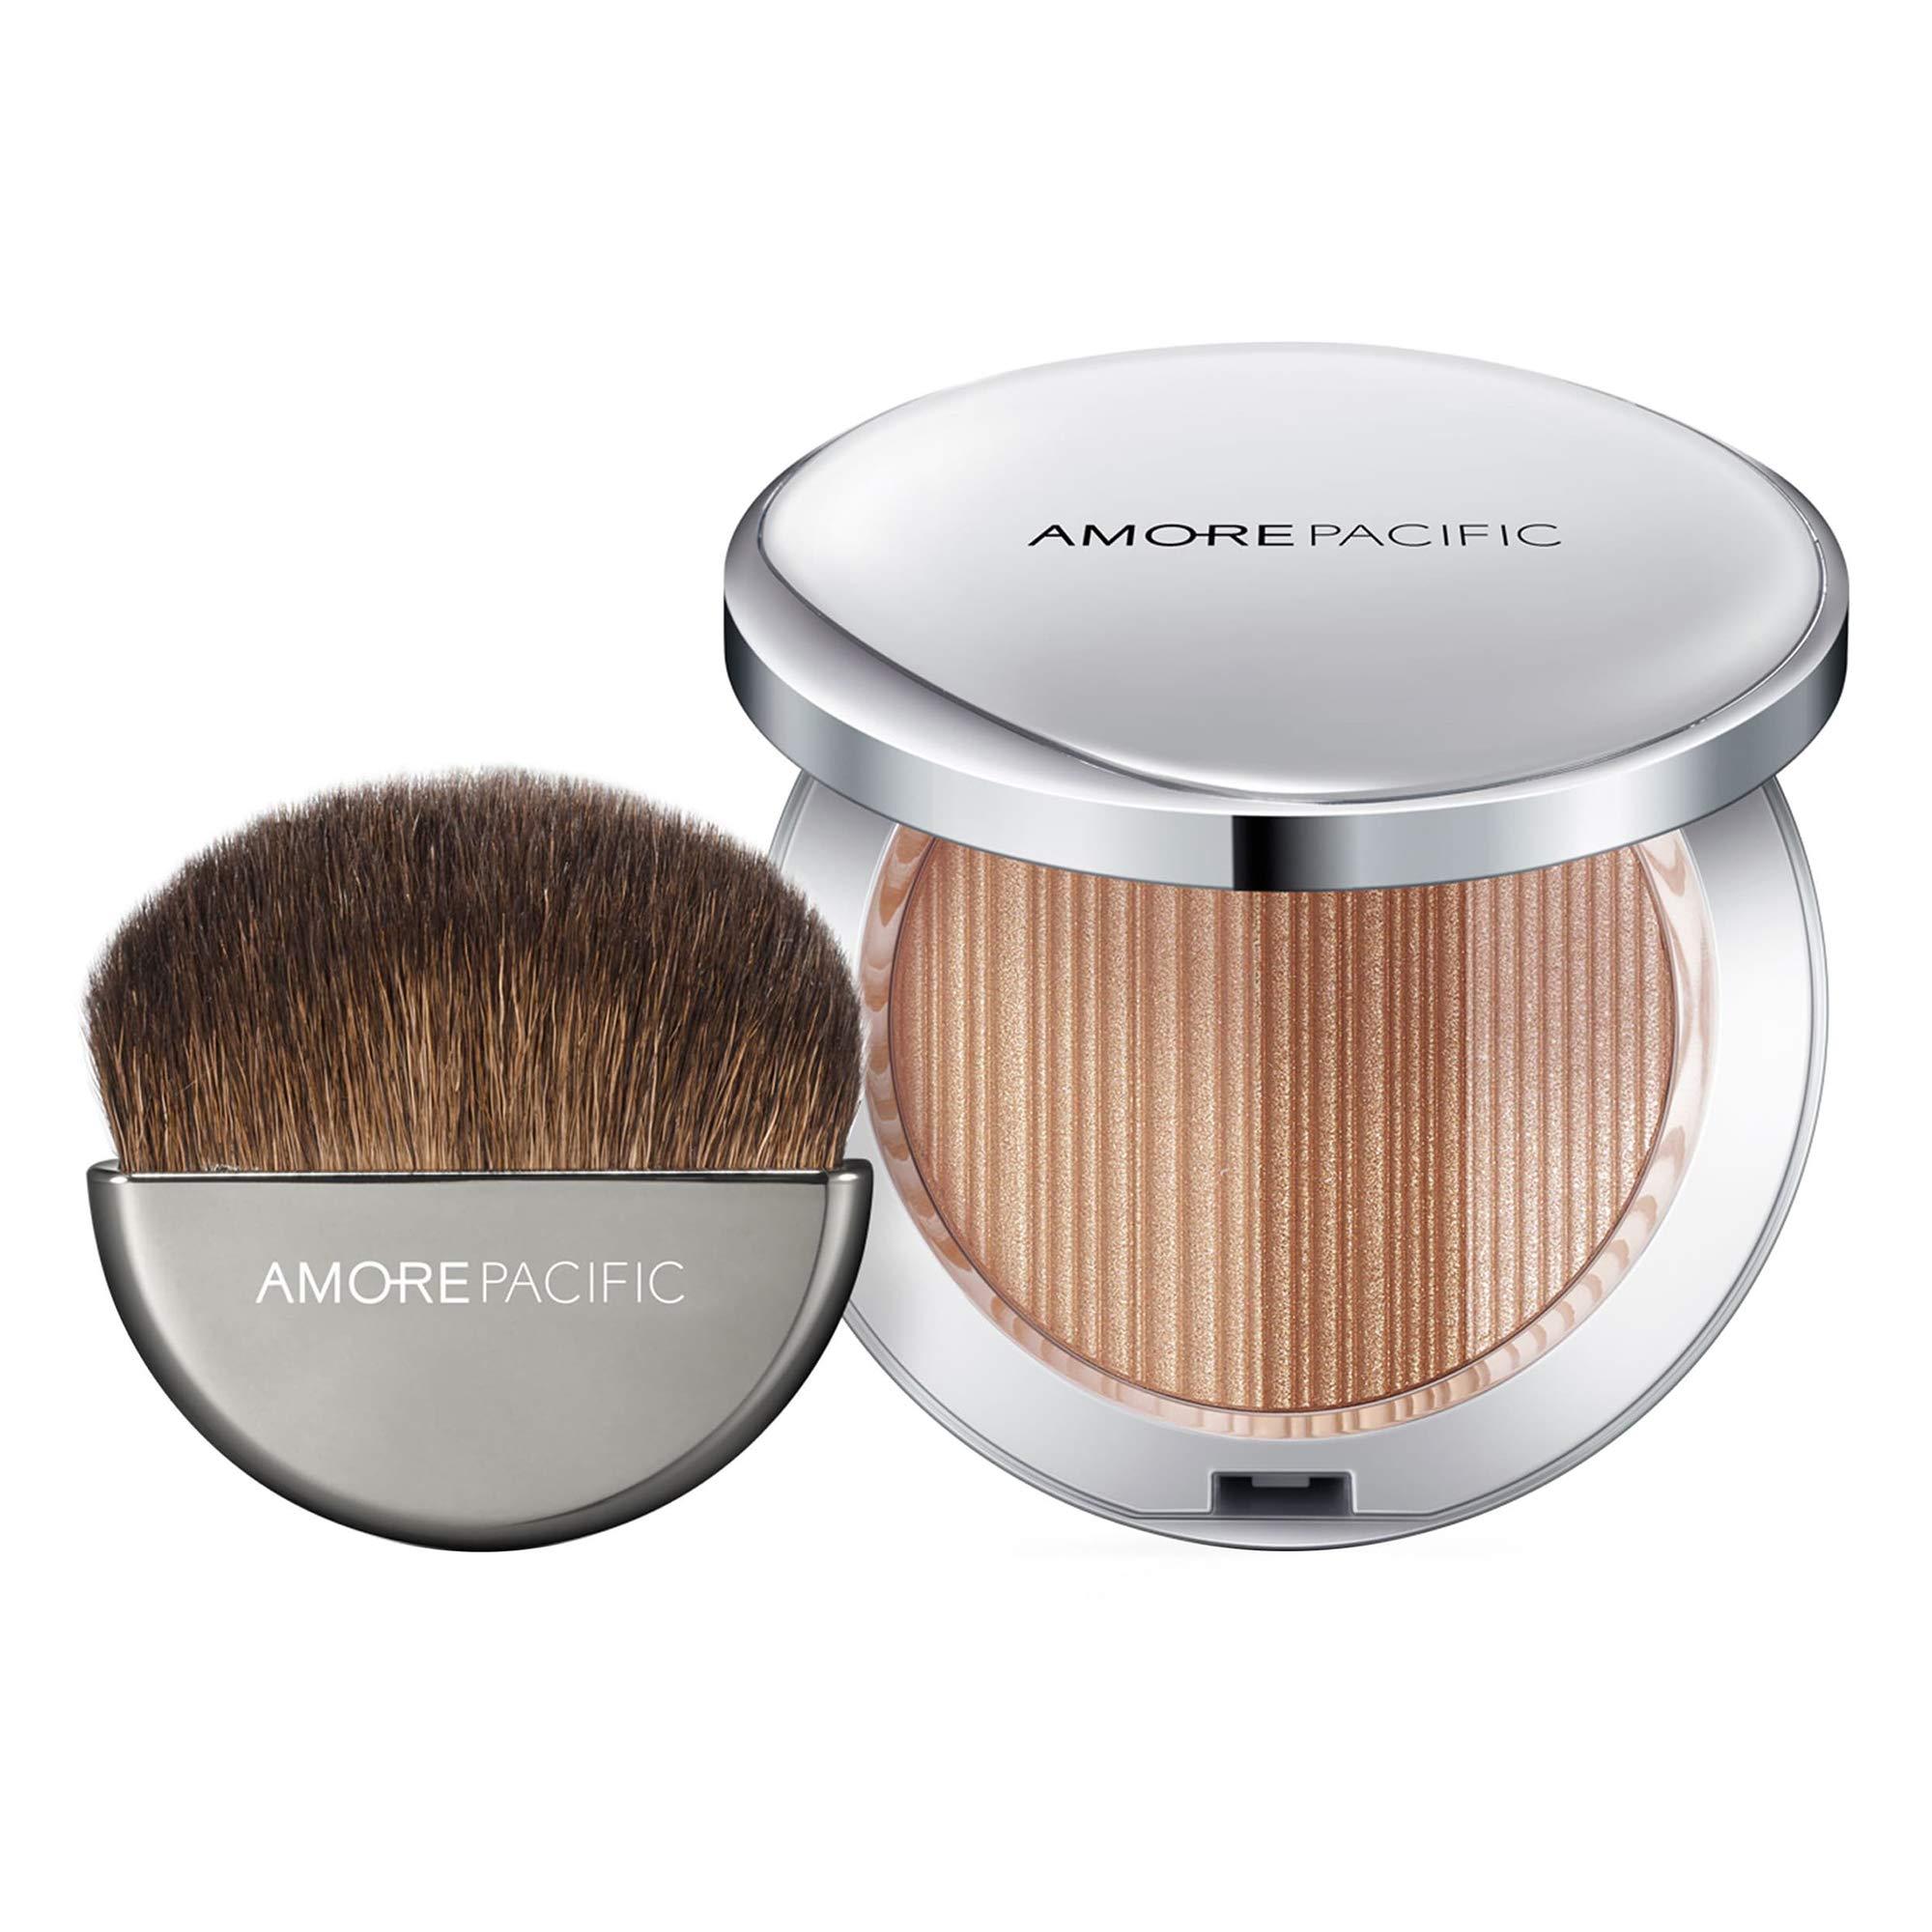 AMOREPACIFIC Color Illuminating Compact Powder Foundation Makeup